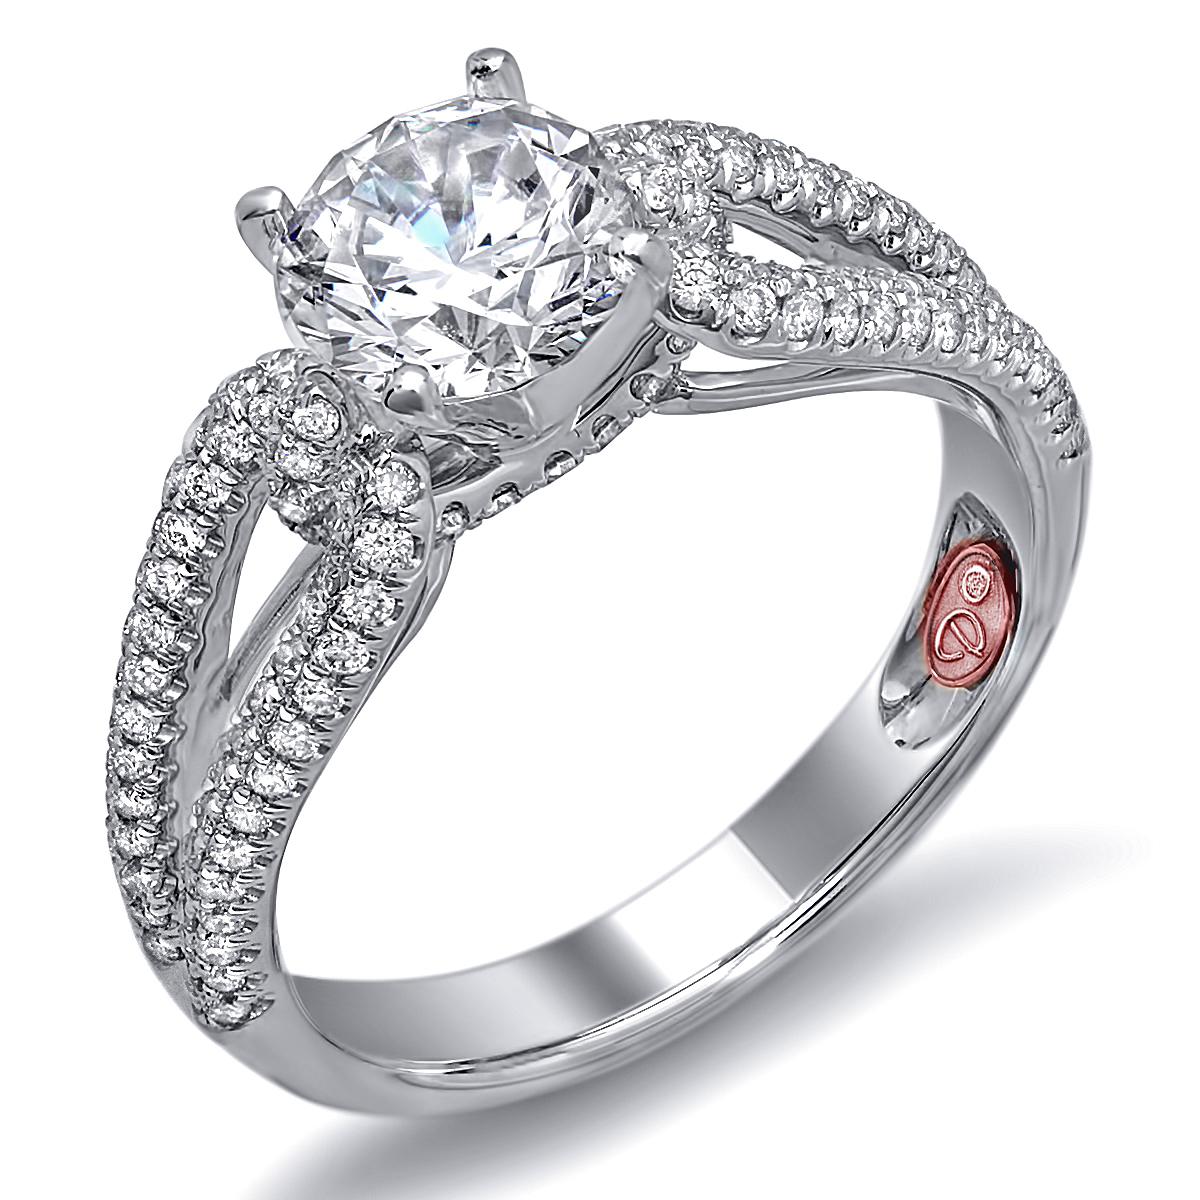 images of designer wedding rings - #spacehero